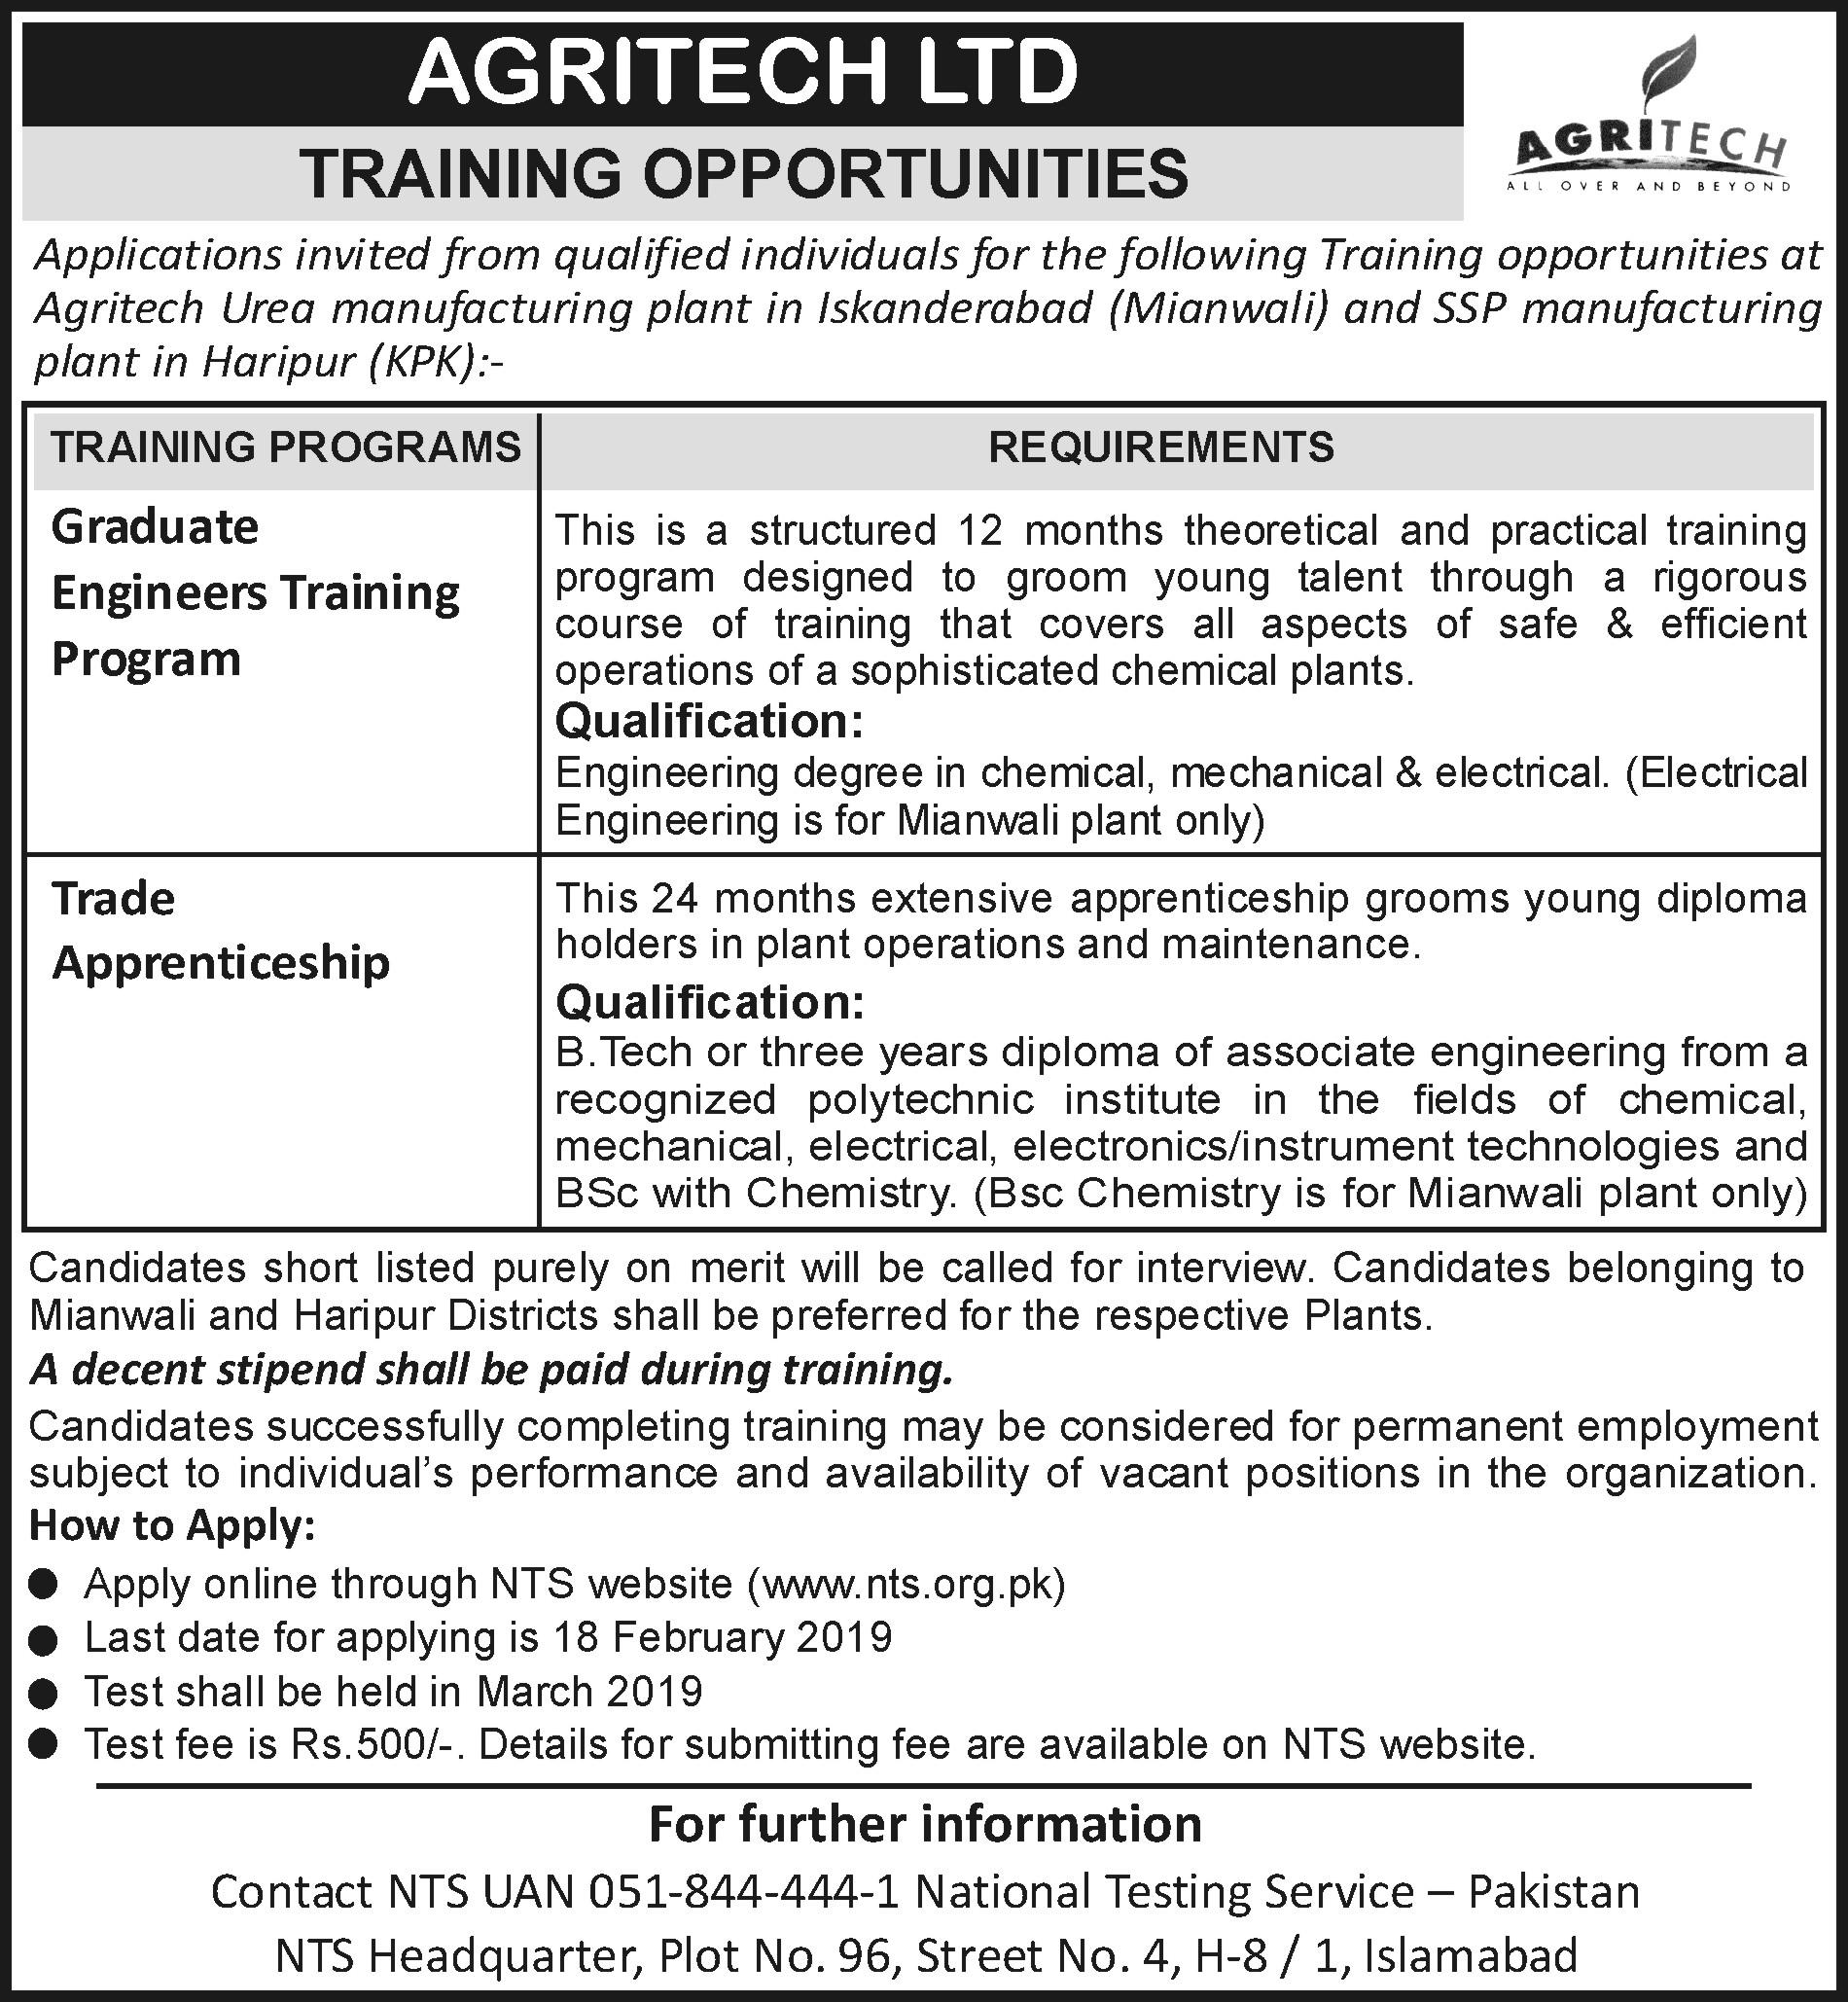 AgriTech Urea Iskanderabad Mianwali Jobs 2019 NTS Test Application Form Last Date